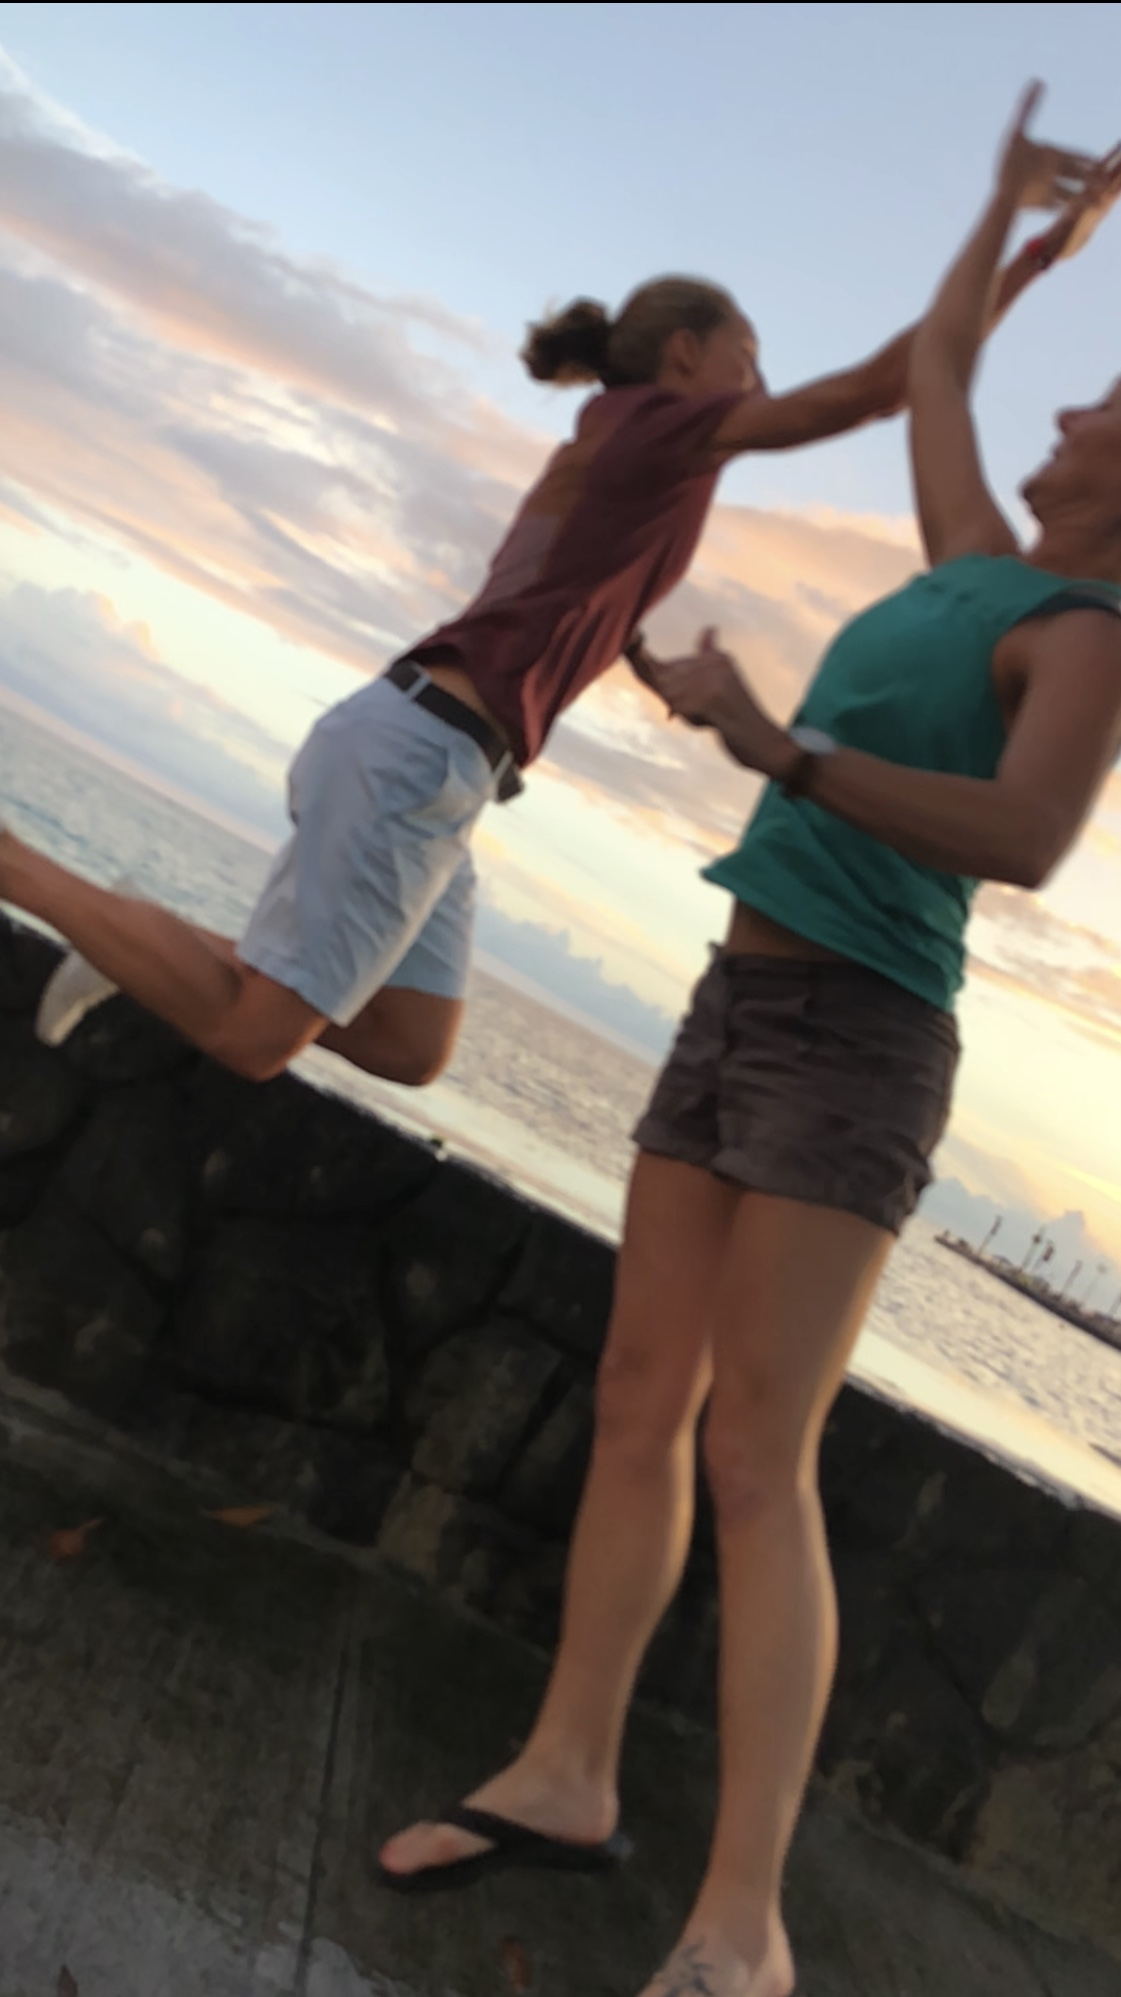 Hawaiian sunset high-five with my sister and team captain, Sarah Fox.